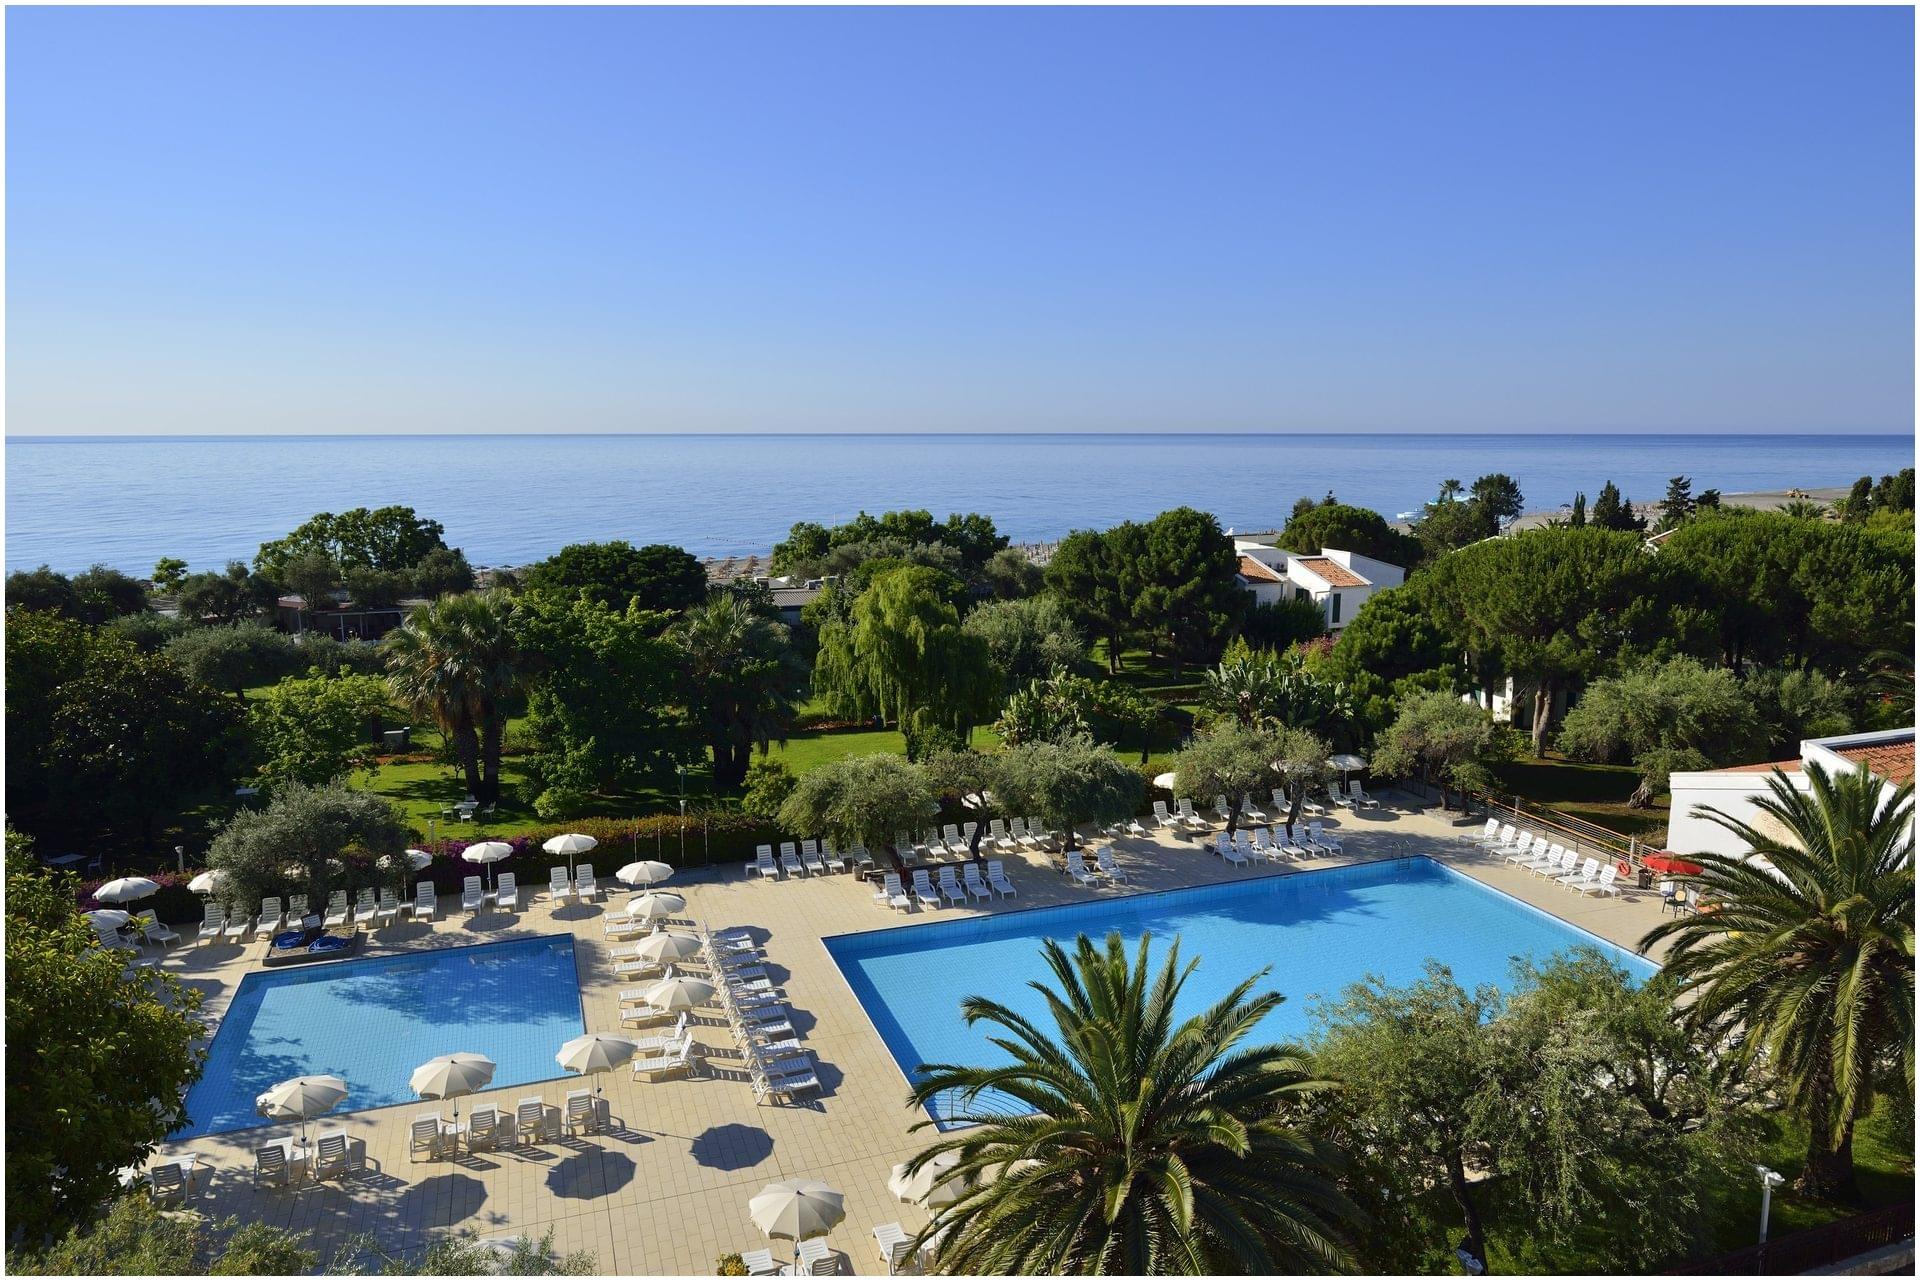 Top Italian Beach Hotels